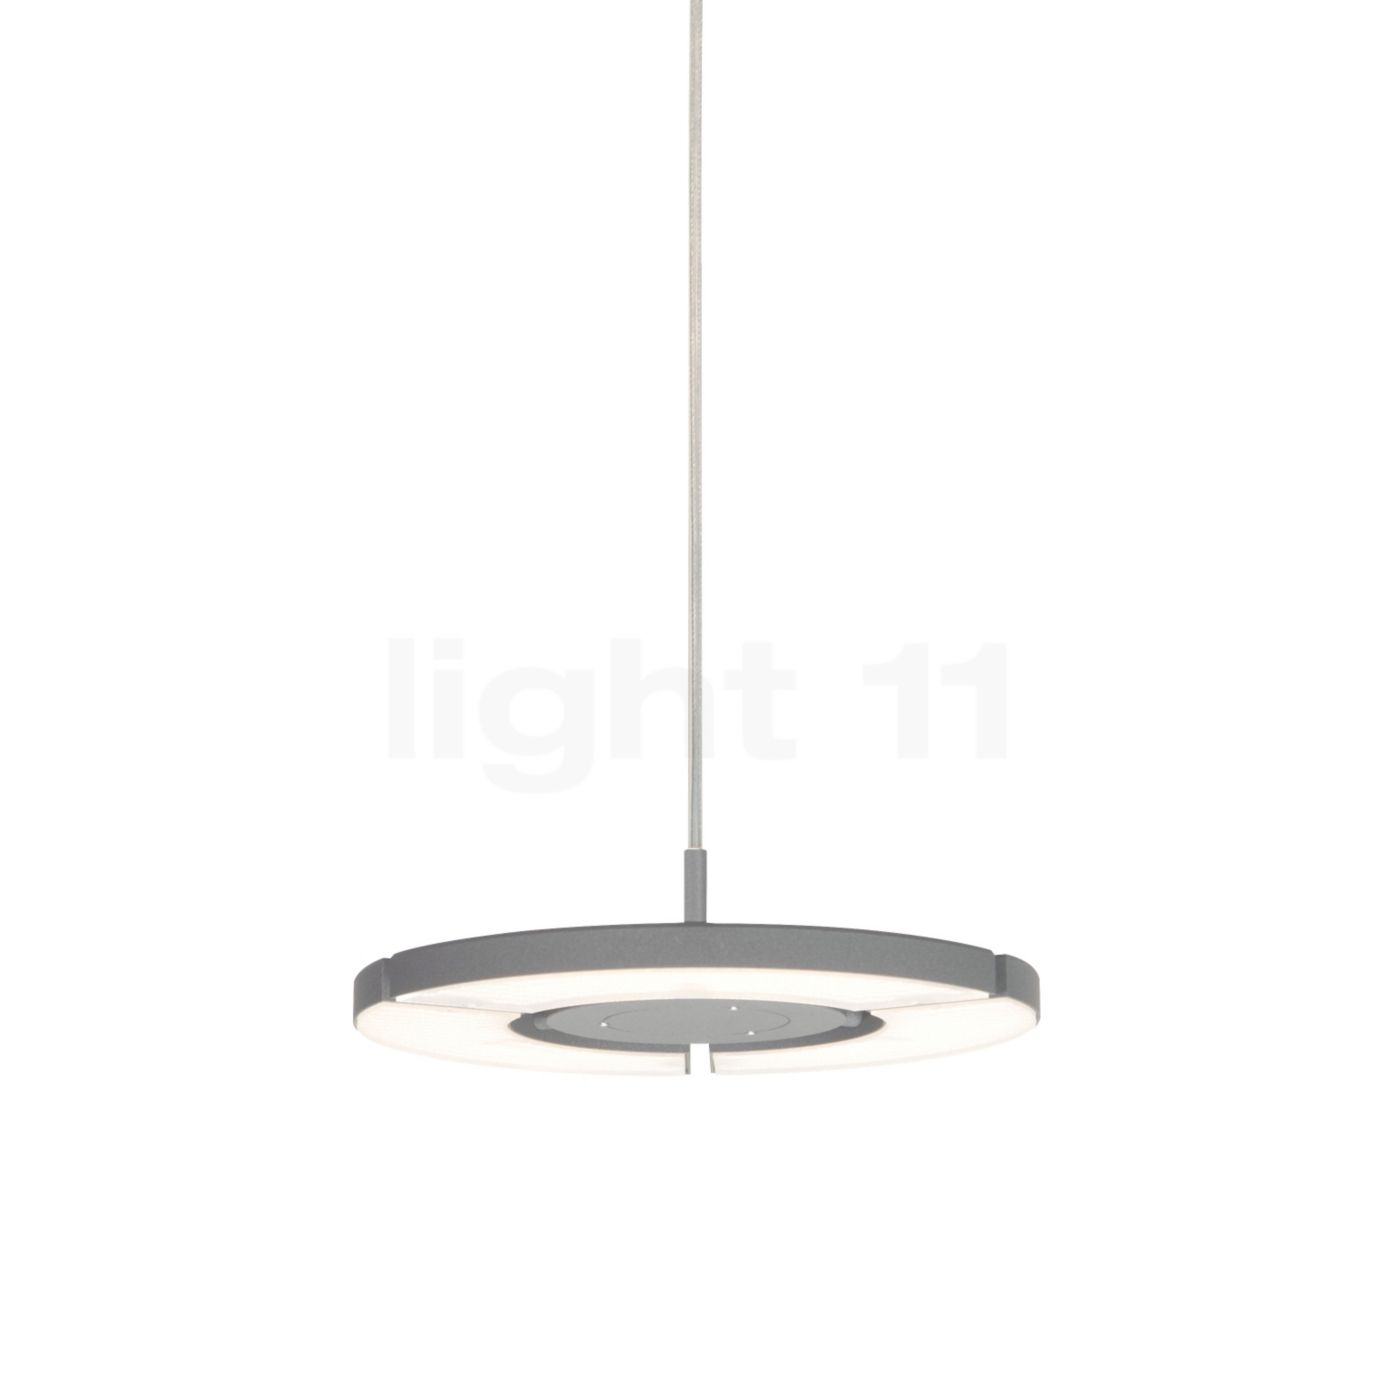 Oligo Trinity Pendelleuchte LED kaufen bei light11.de